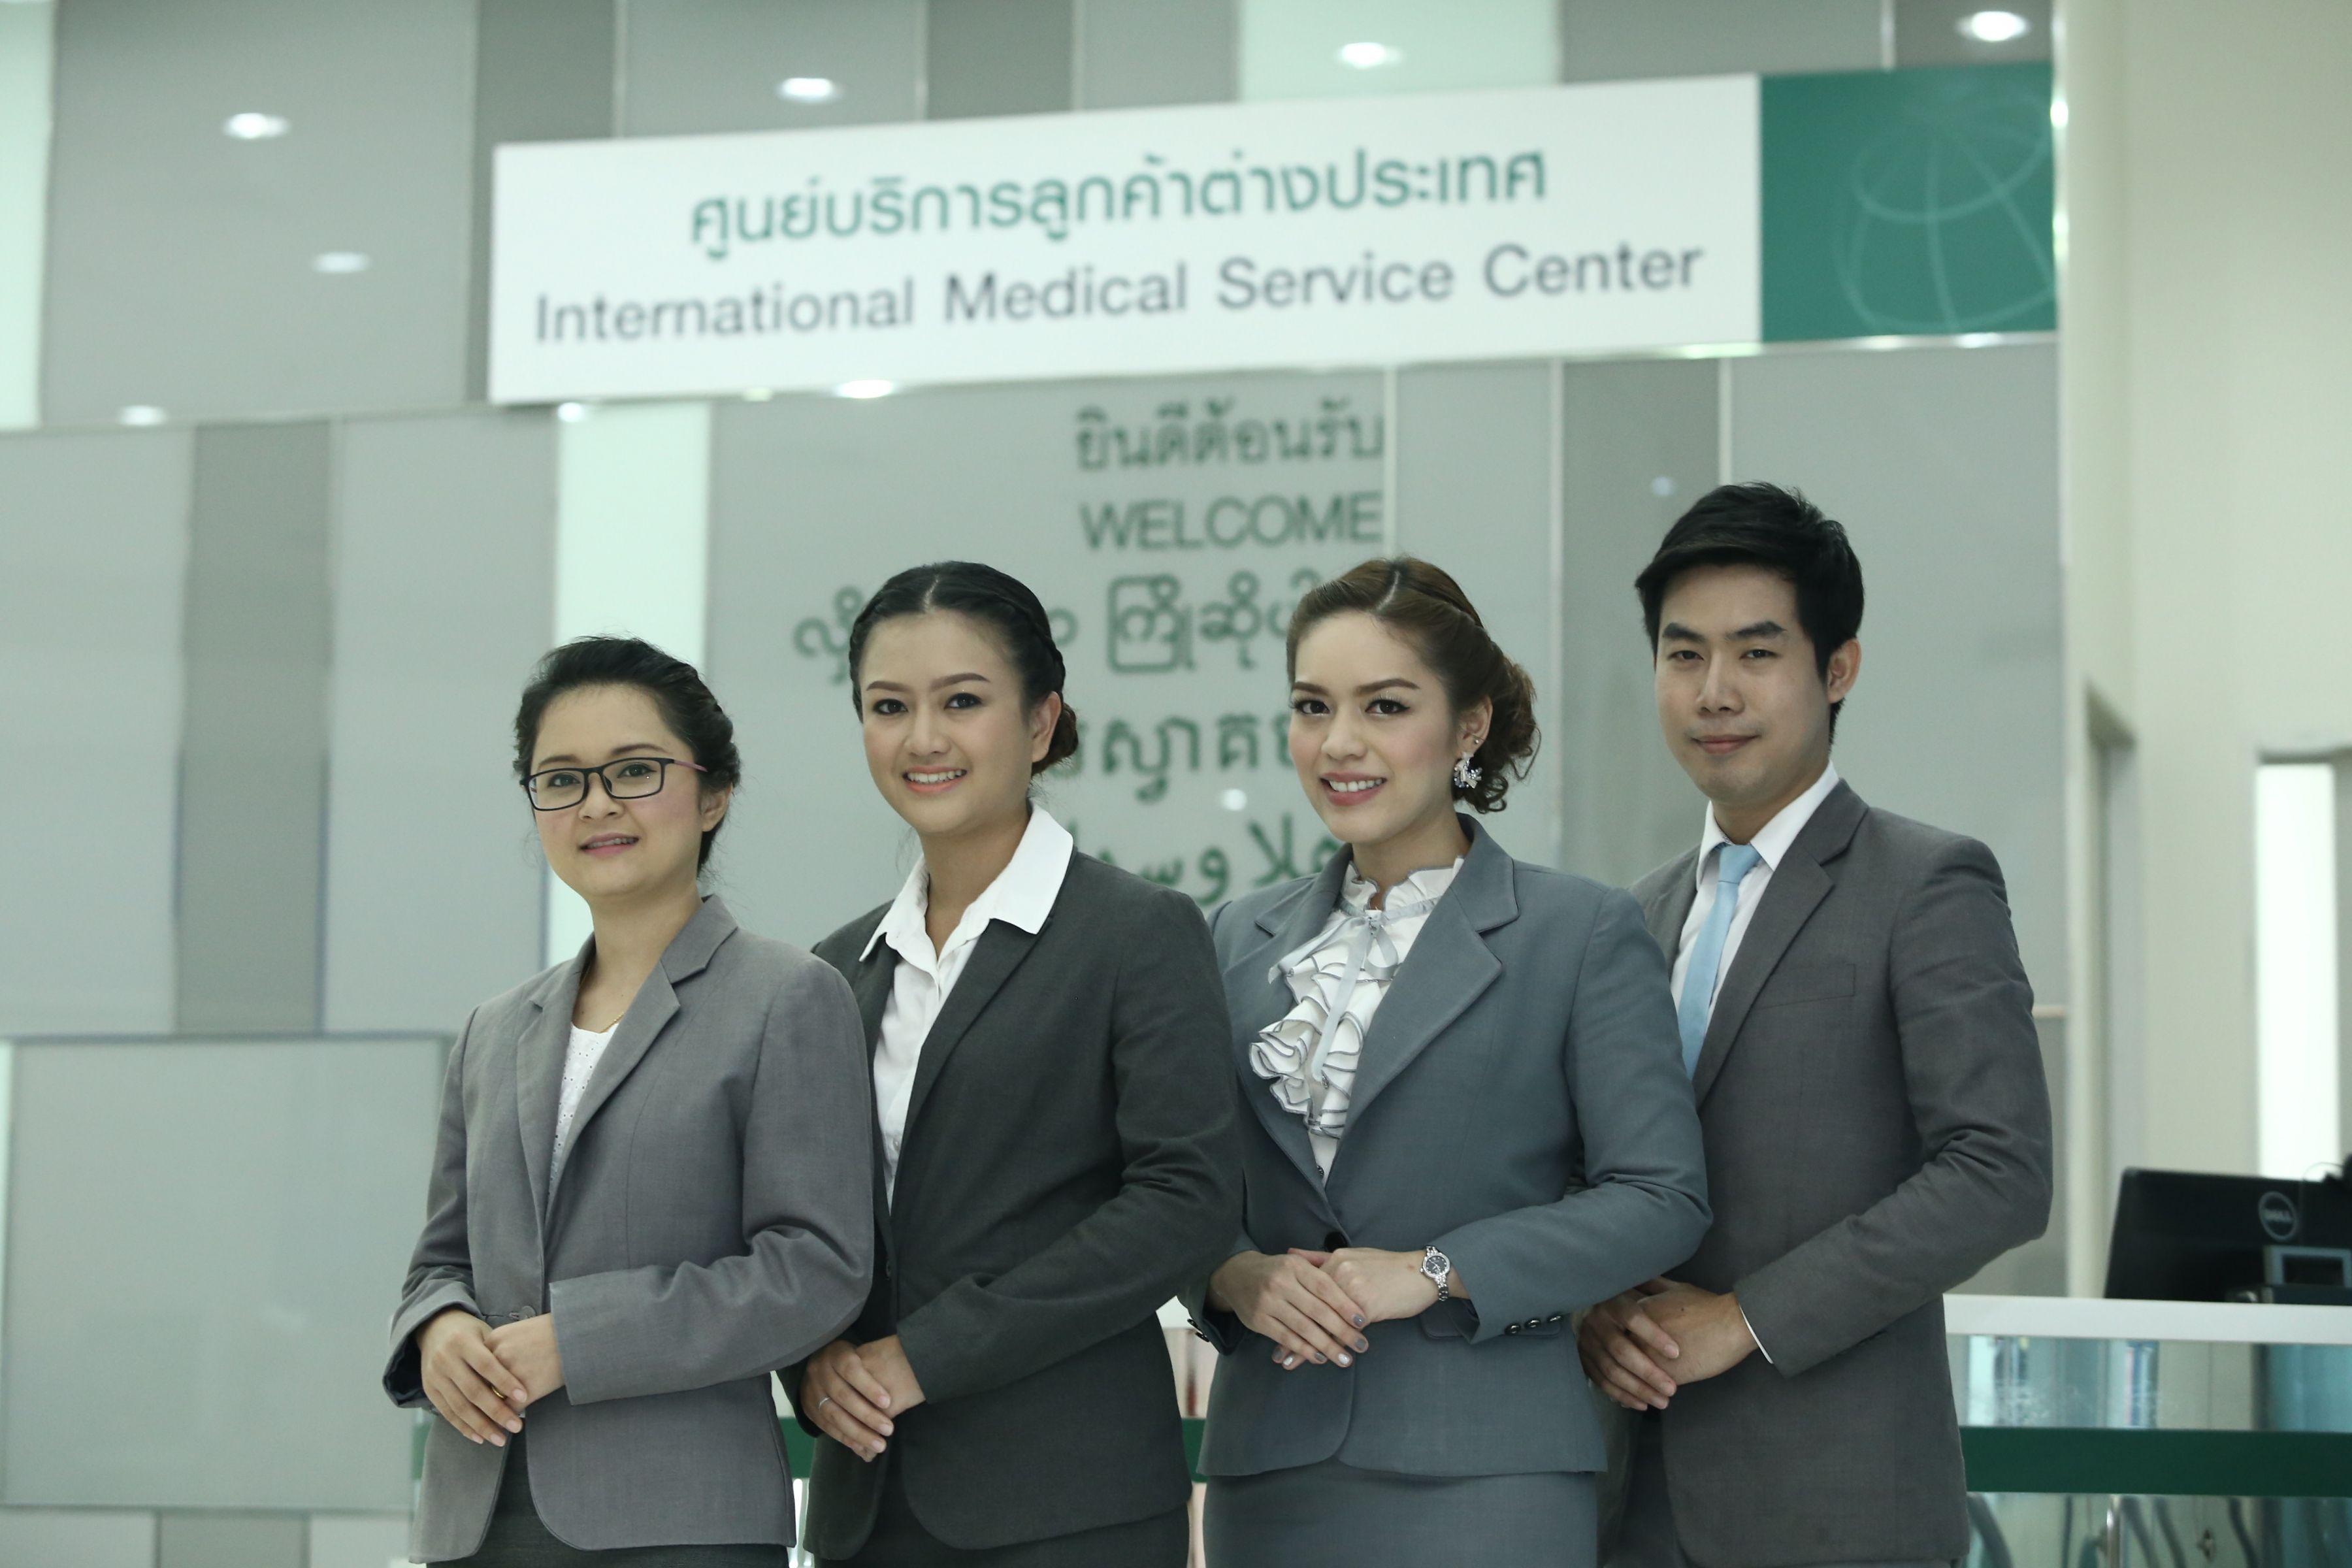 The World Medical Center Hospital